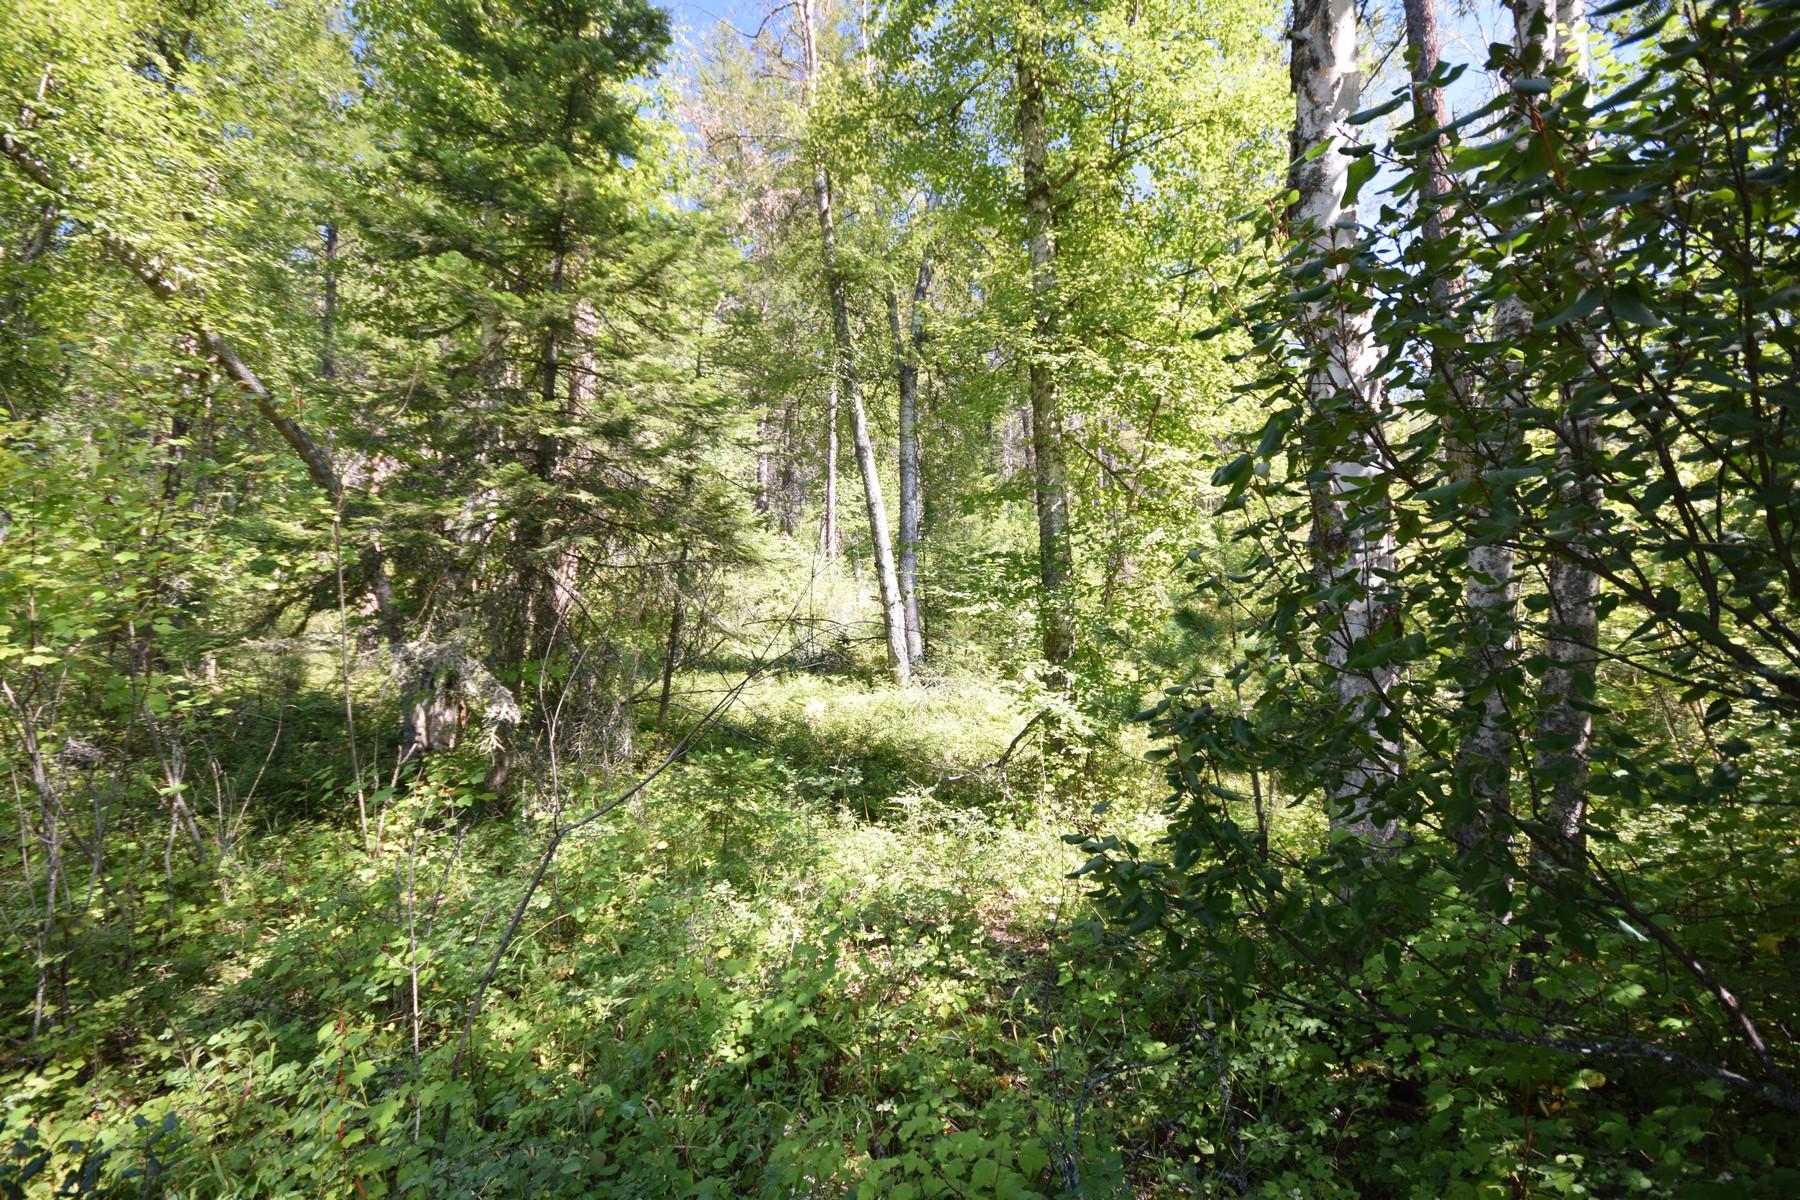 Terreno por un Venta en 682 Latigo Ln , Bigfork, MT 59911 682 Latigo Ln Bigfork, Montana, 59911 Estados Unidos